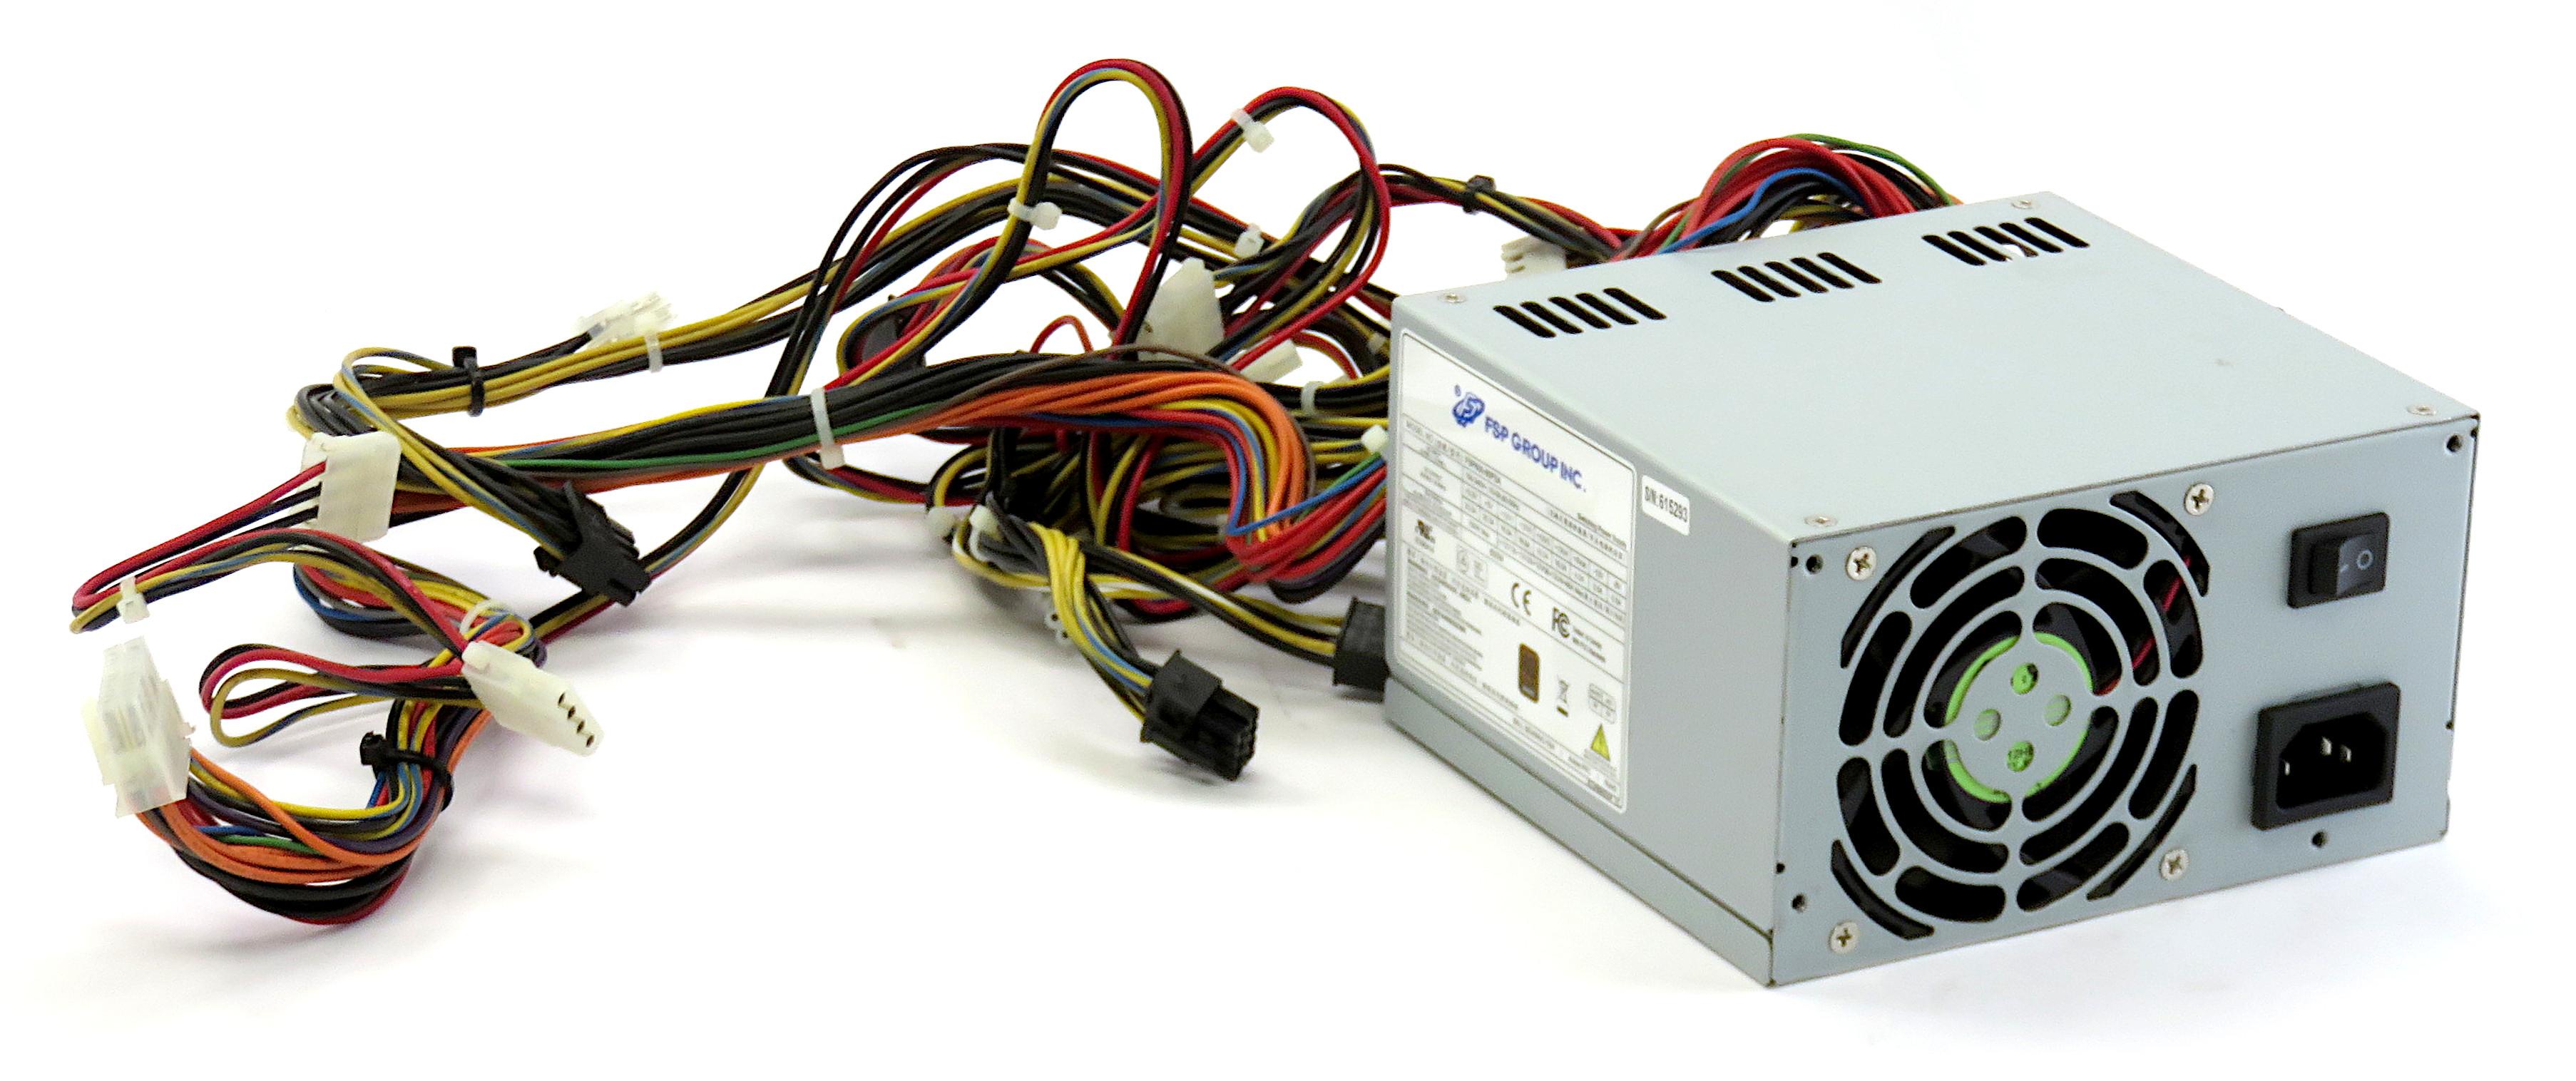 FSP Group FS600-80PSA 80+ Bronze 600W 20/24-Pin ATX Power Supply 9PA6002221